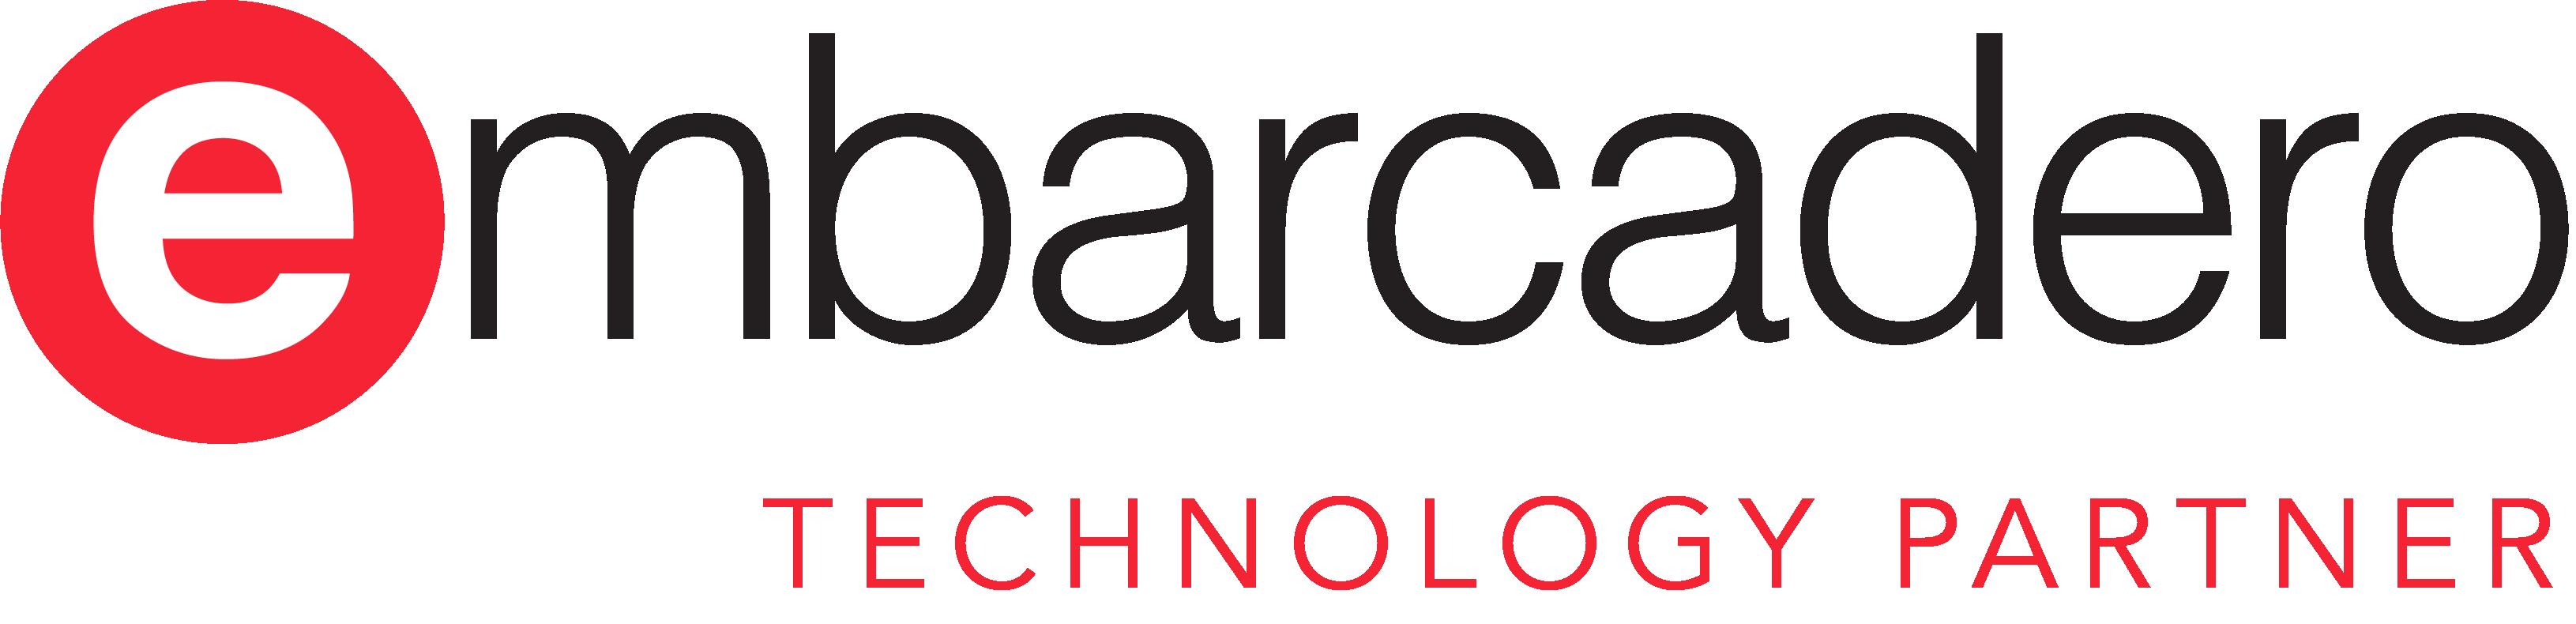 Technology Partner Embarcadero